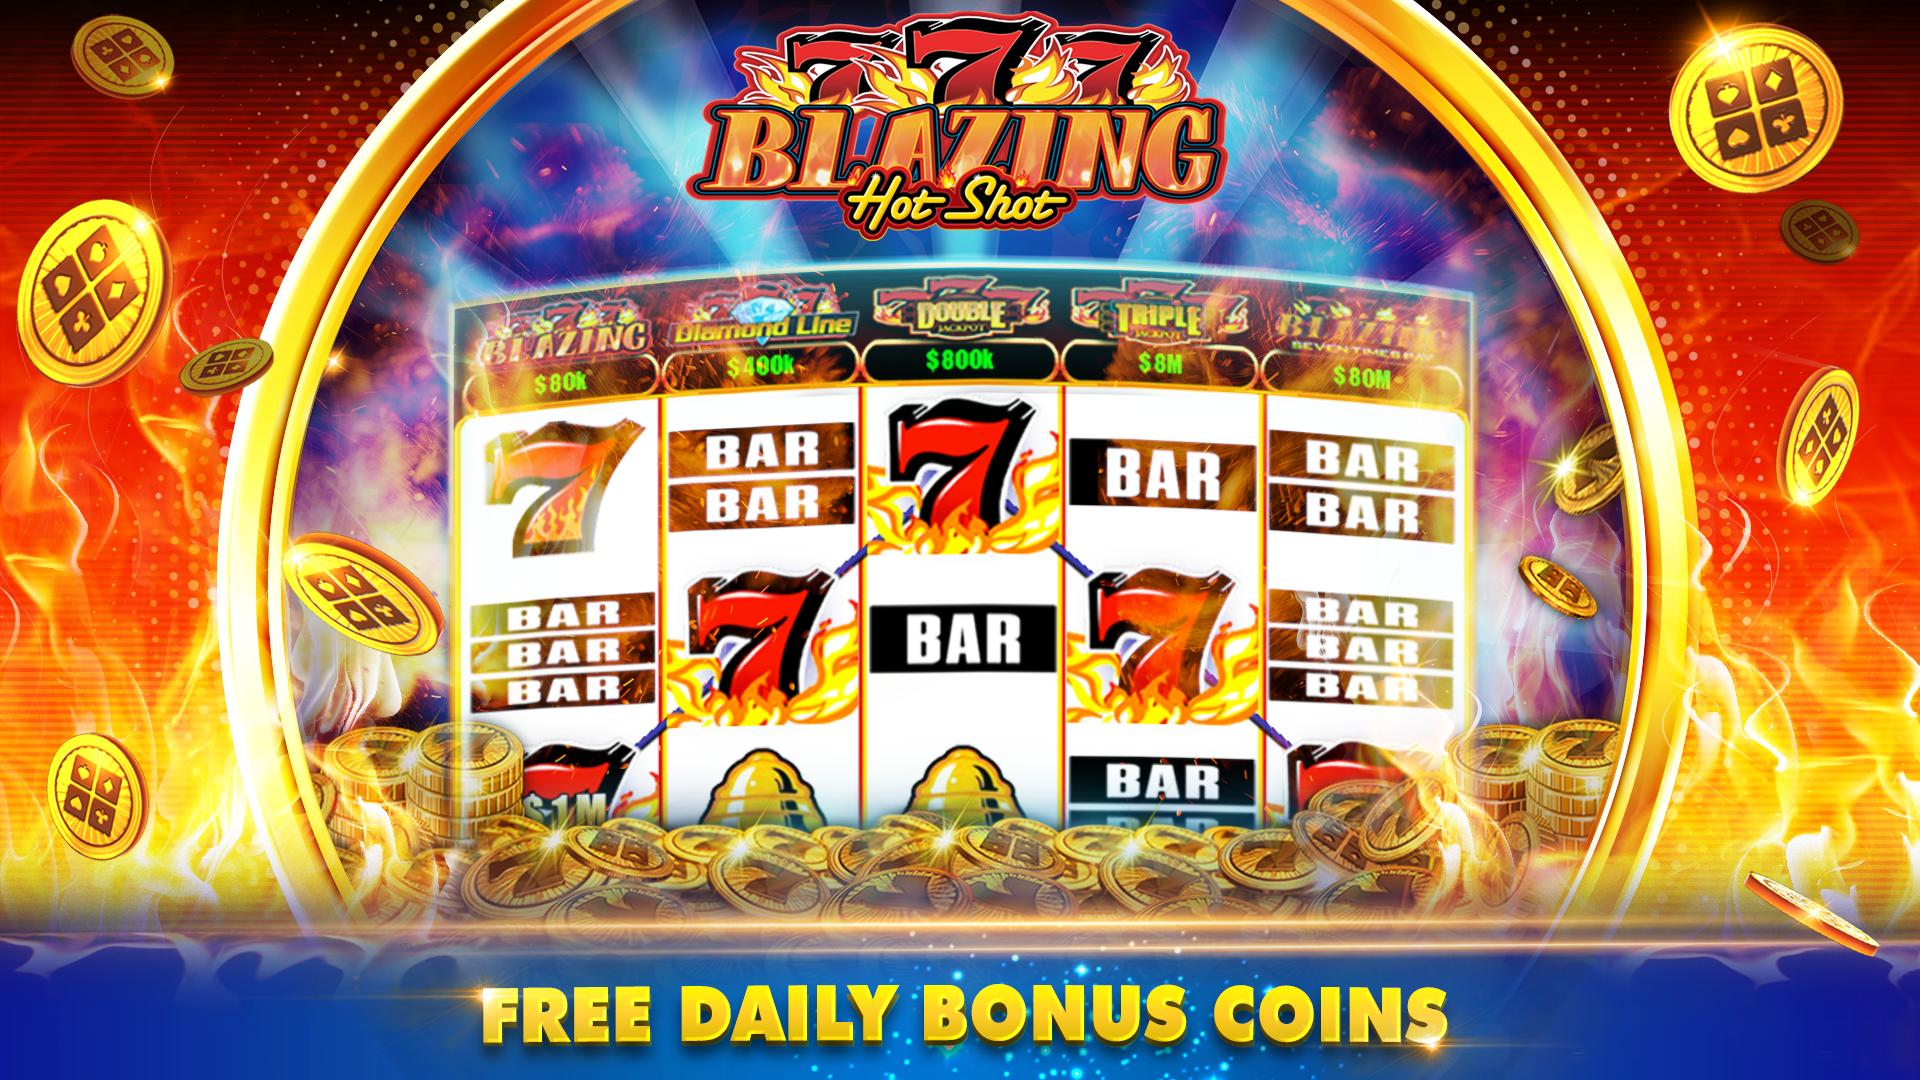 Hot Shots Casino